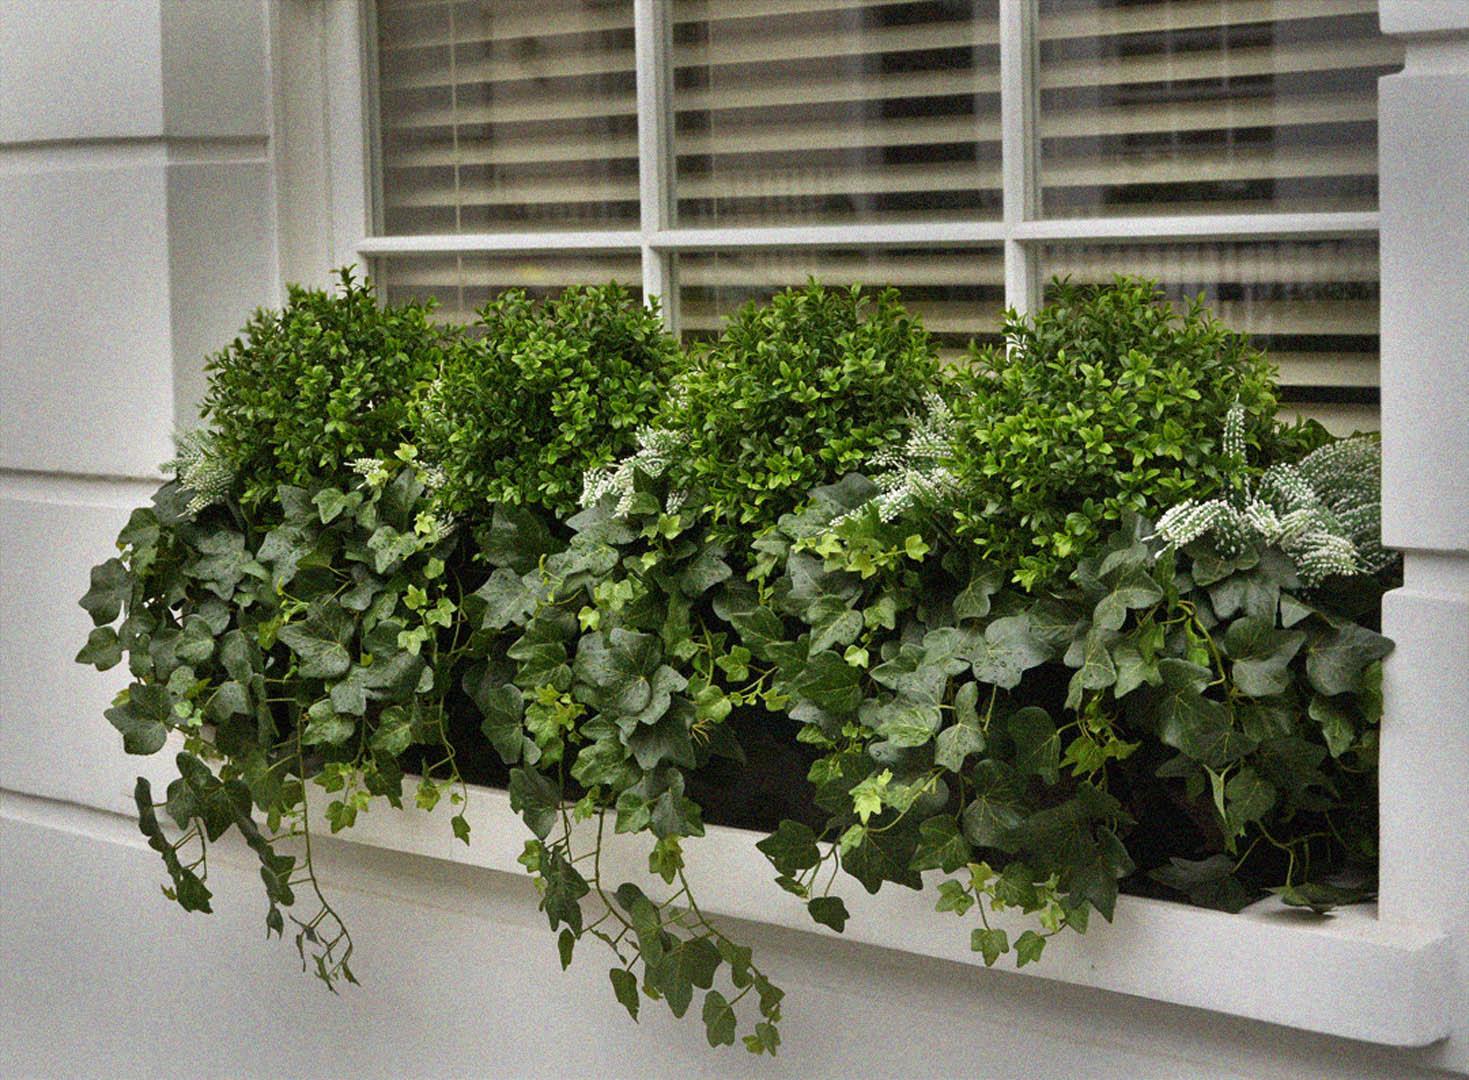 482 fake landscapes custom 110cm ivy, boxwood and erica window box 1080DEF